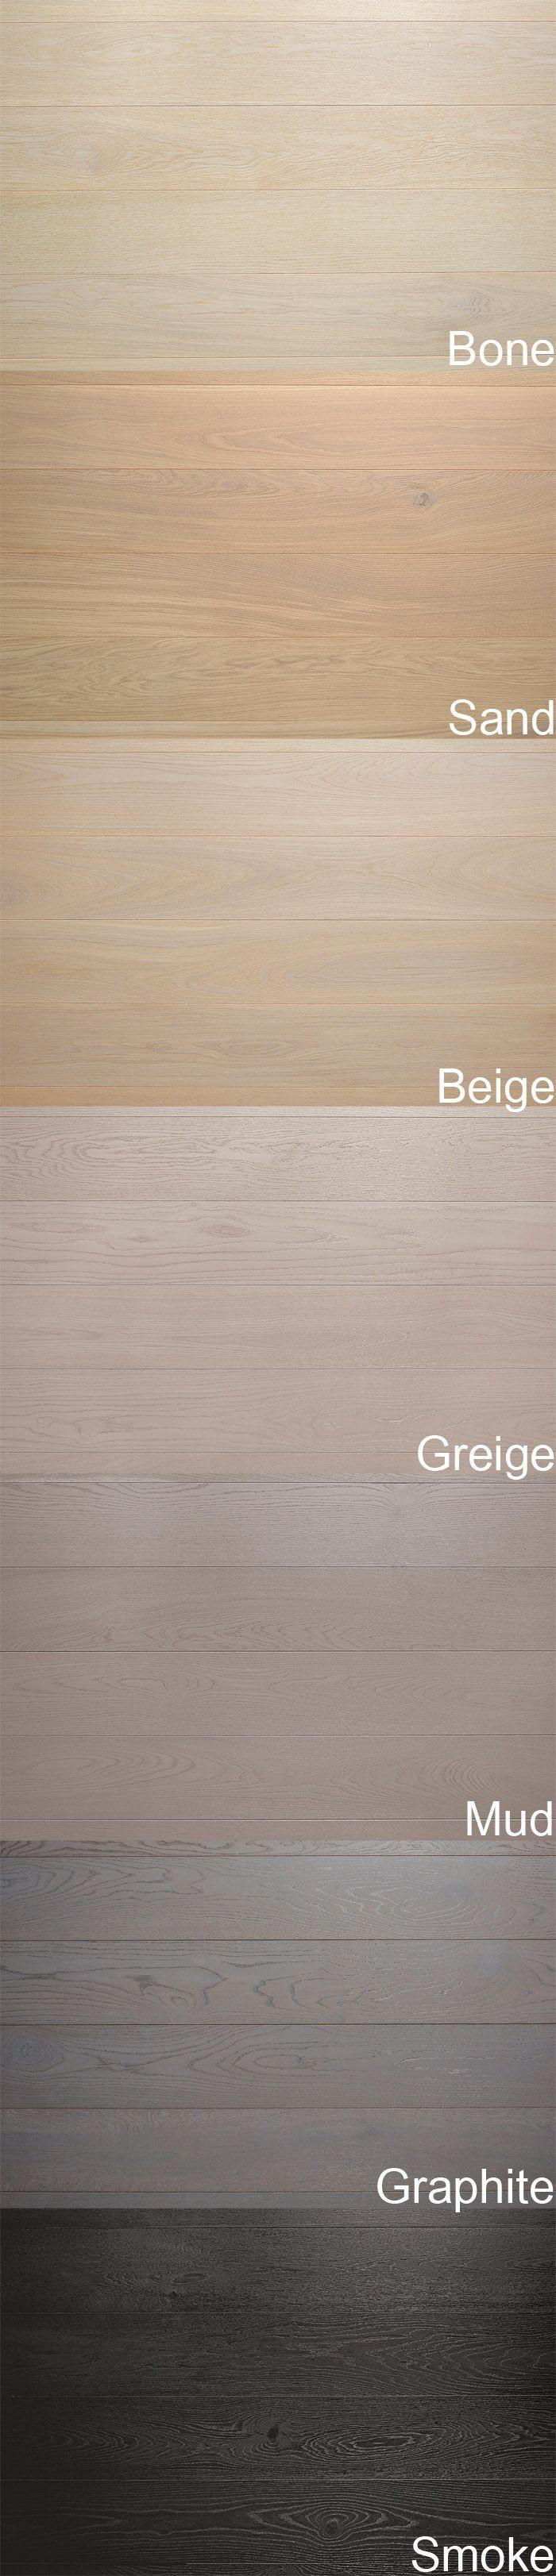 hardwood floor refinishing knoxville tn of 140 best coastal flooring images on pinterest ground covering pertaining to legno base www brixweb com brix tile tiles www forgiarini